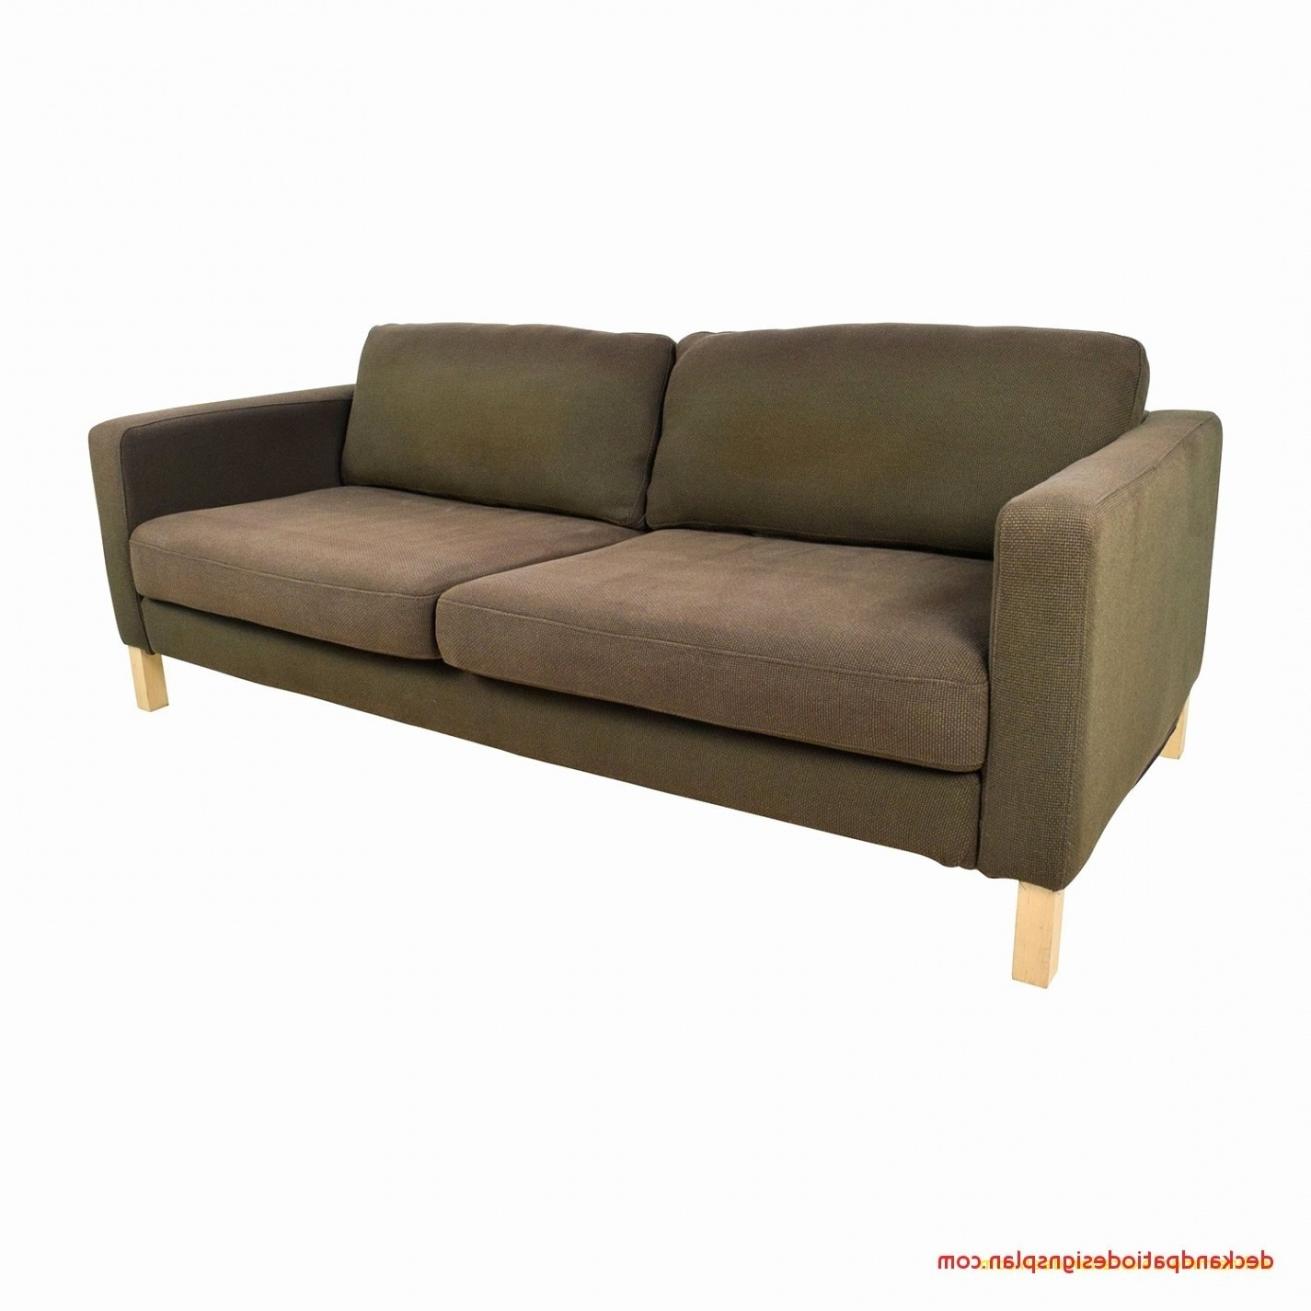 Sofa Cama Desplegable Txdf Las Maravilloso sofa Cama Desplegable Proyecto Debido A Condecorar